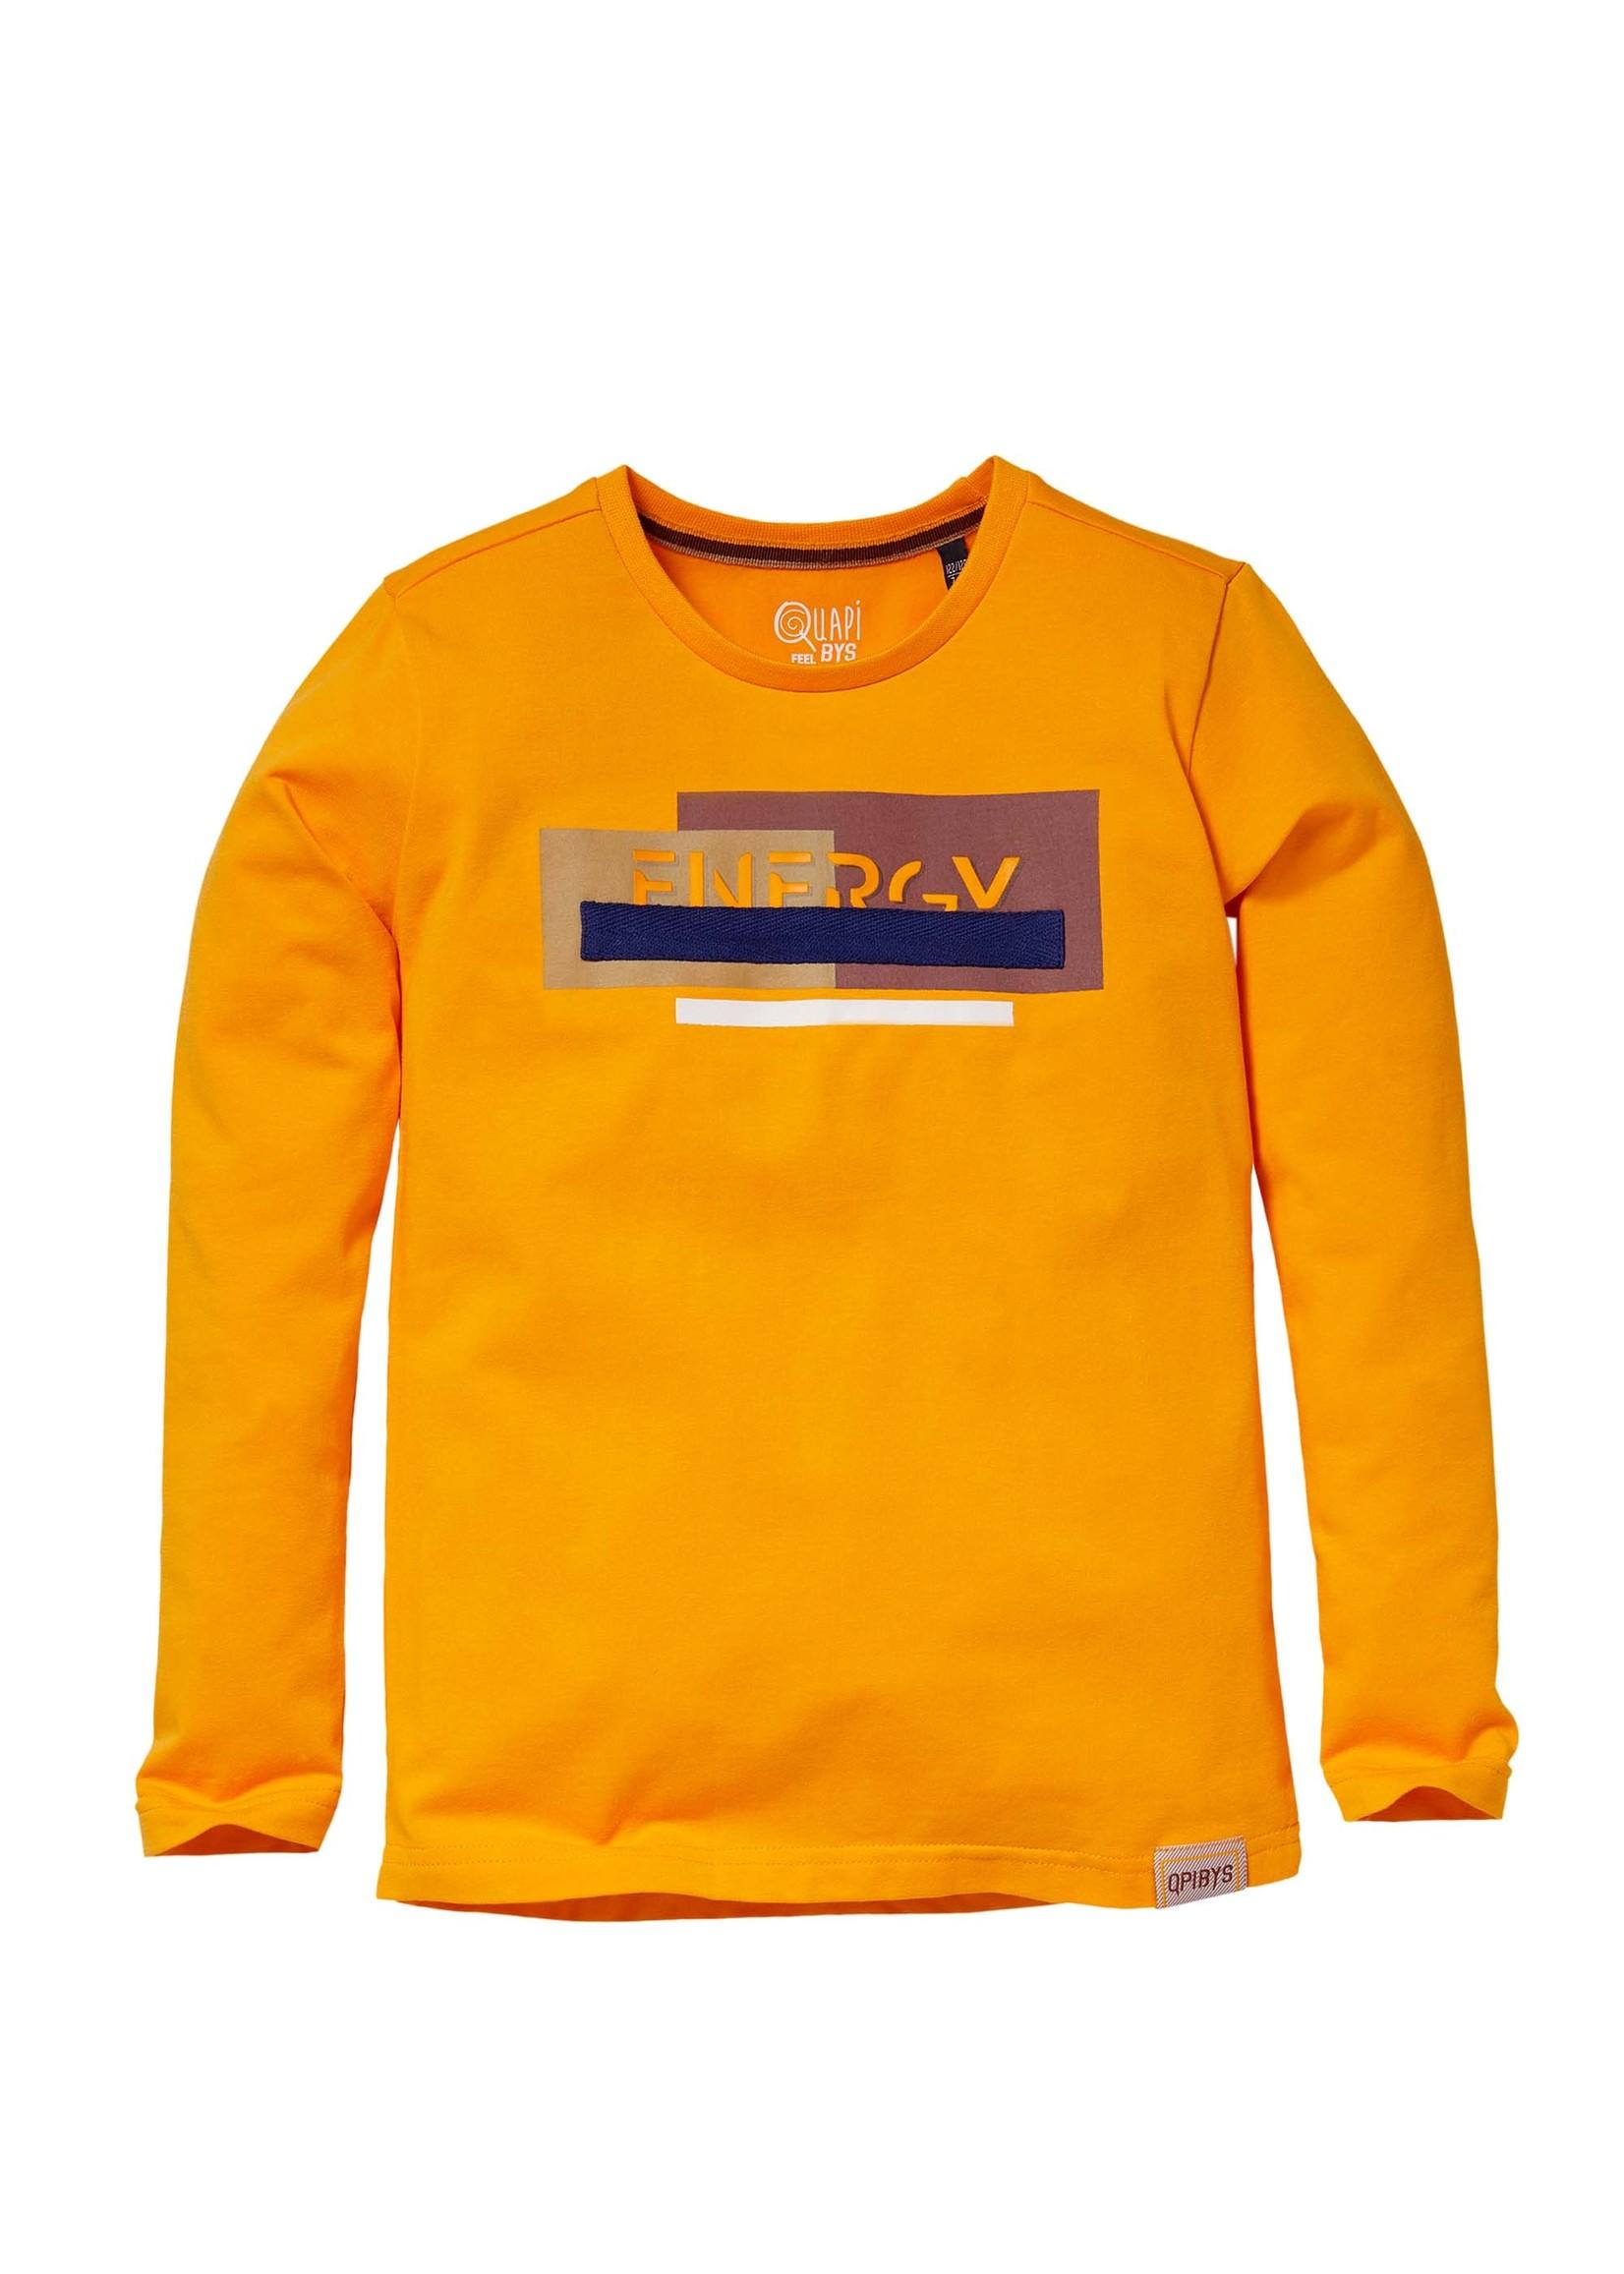 Quapi Longsleeve Kamel Orange Yellow